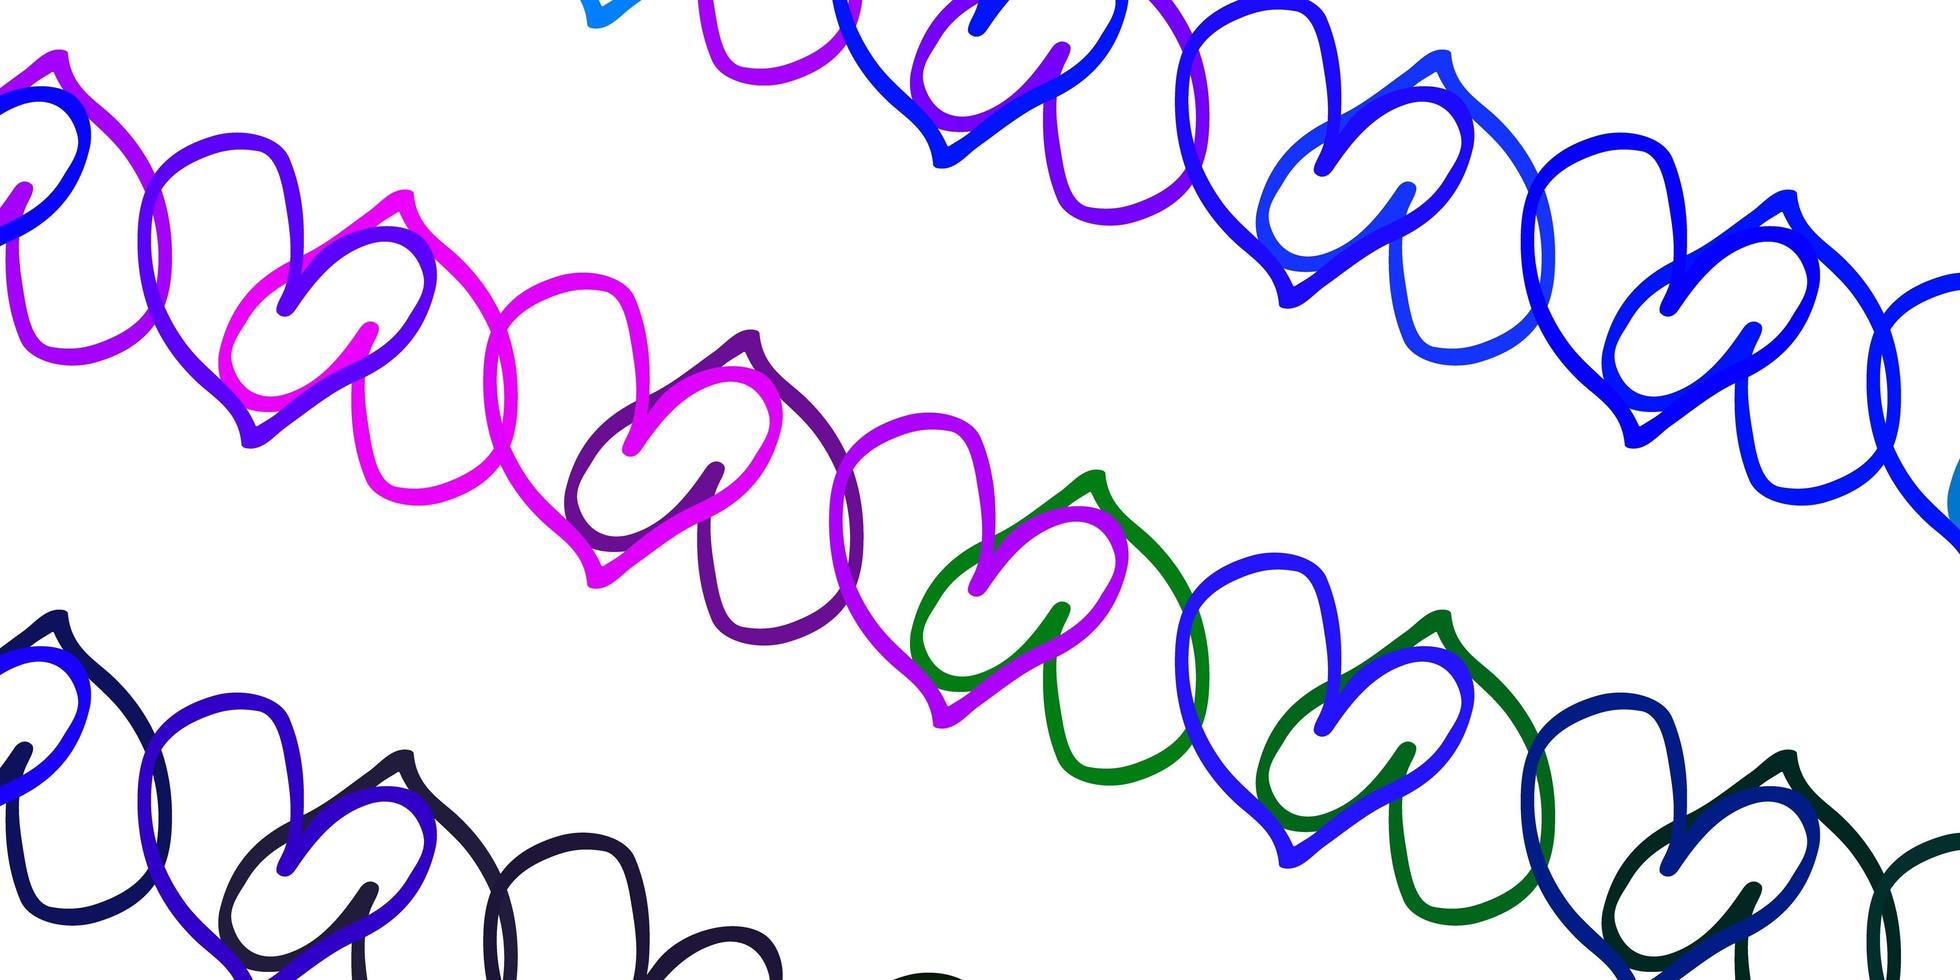 fond de vecteur rose clair, bleu avec des coeurs brillants.